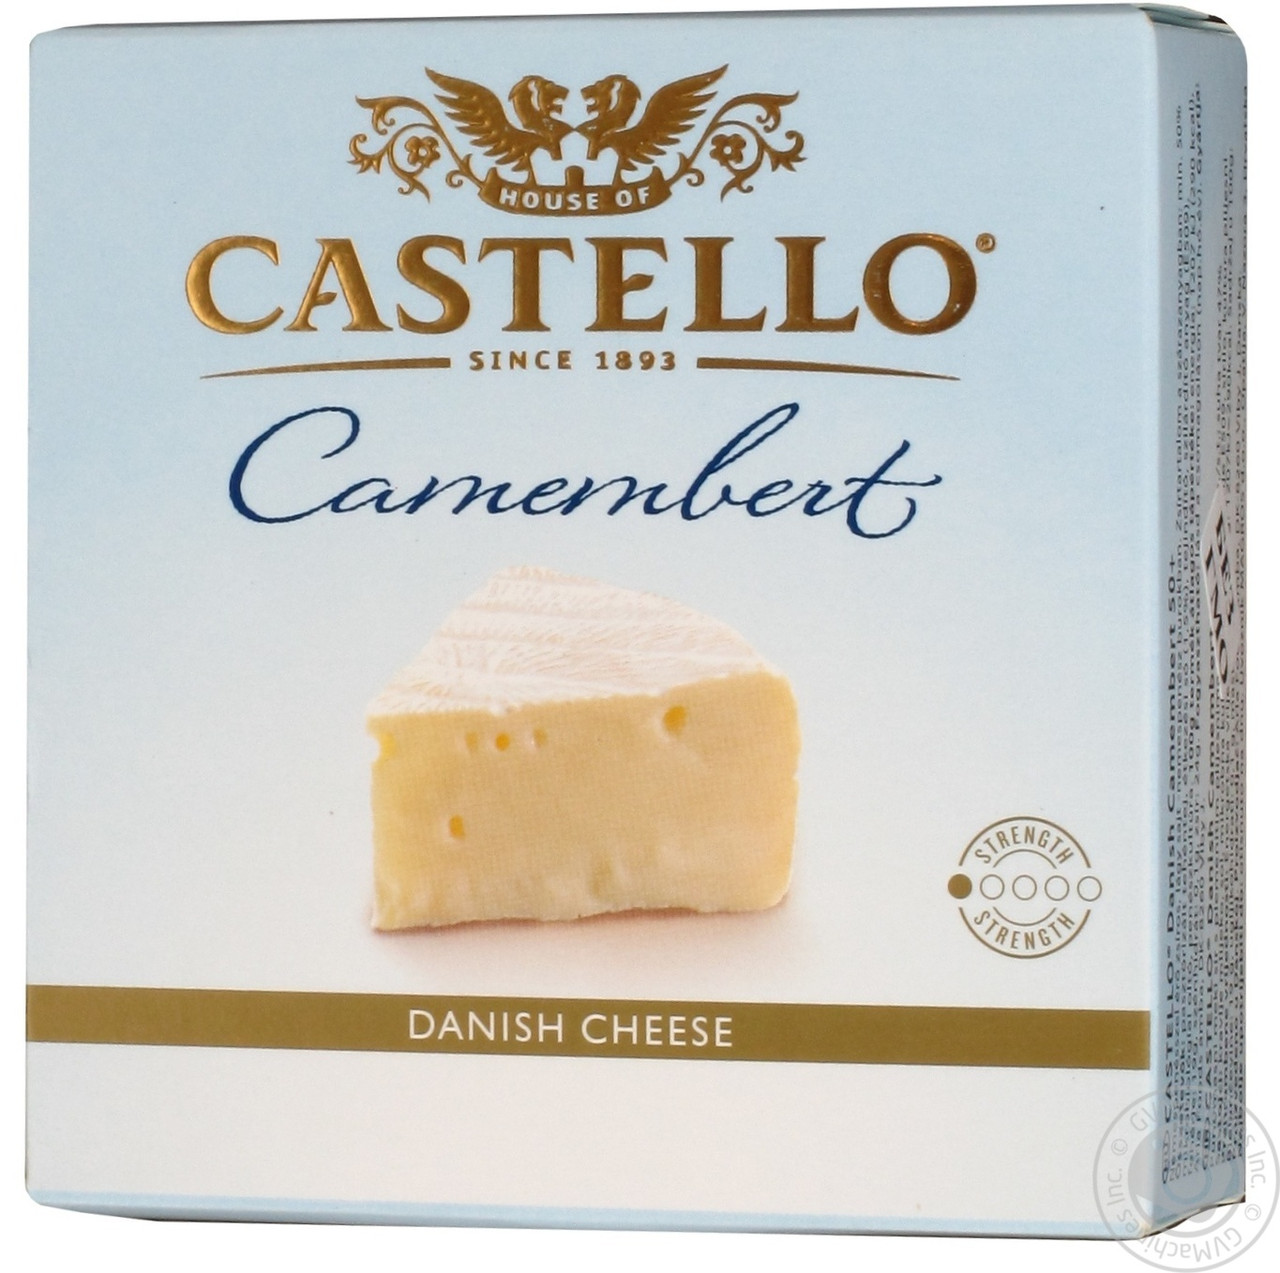 Castello Camembert Сыр Кастелло камамбер мягкий с белой плесенью 50% 125г Дания